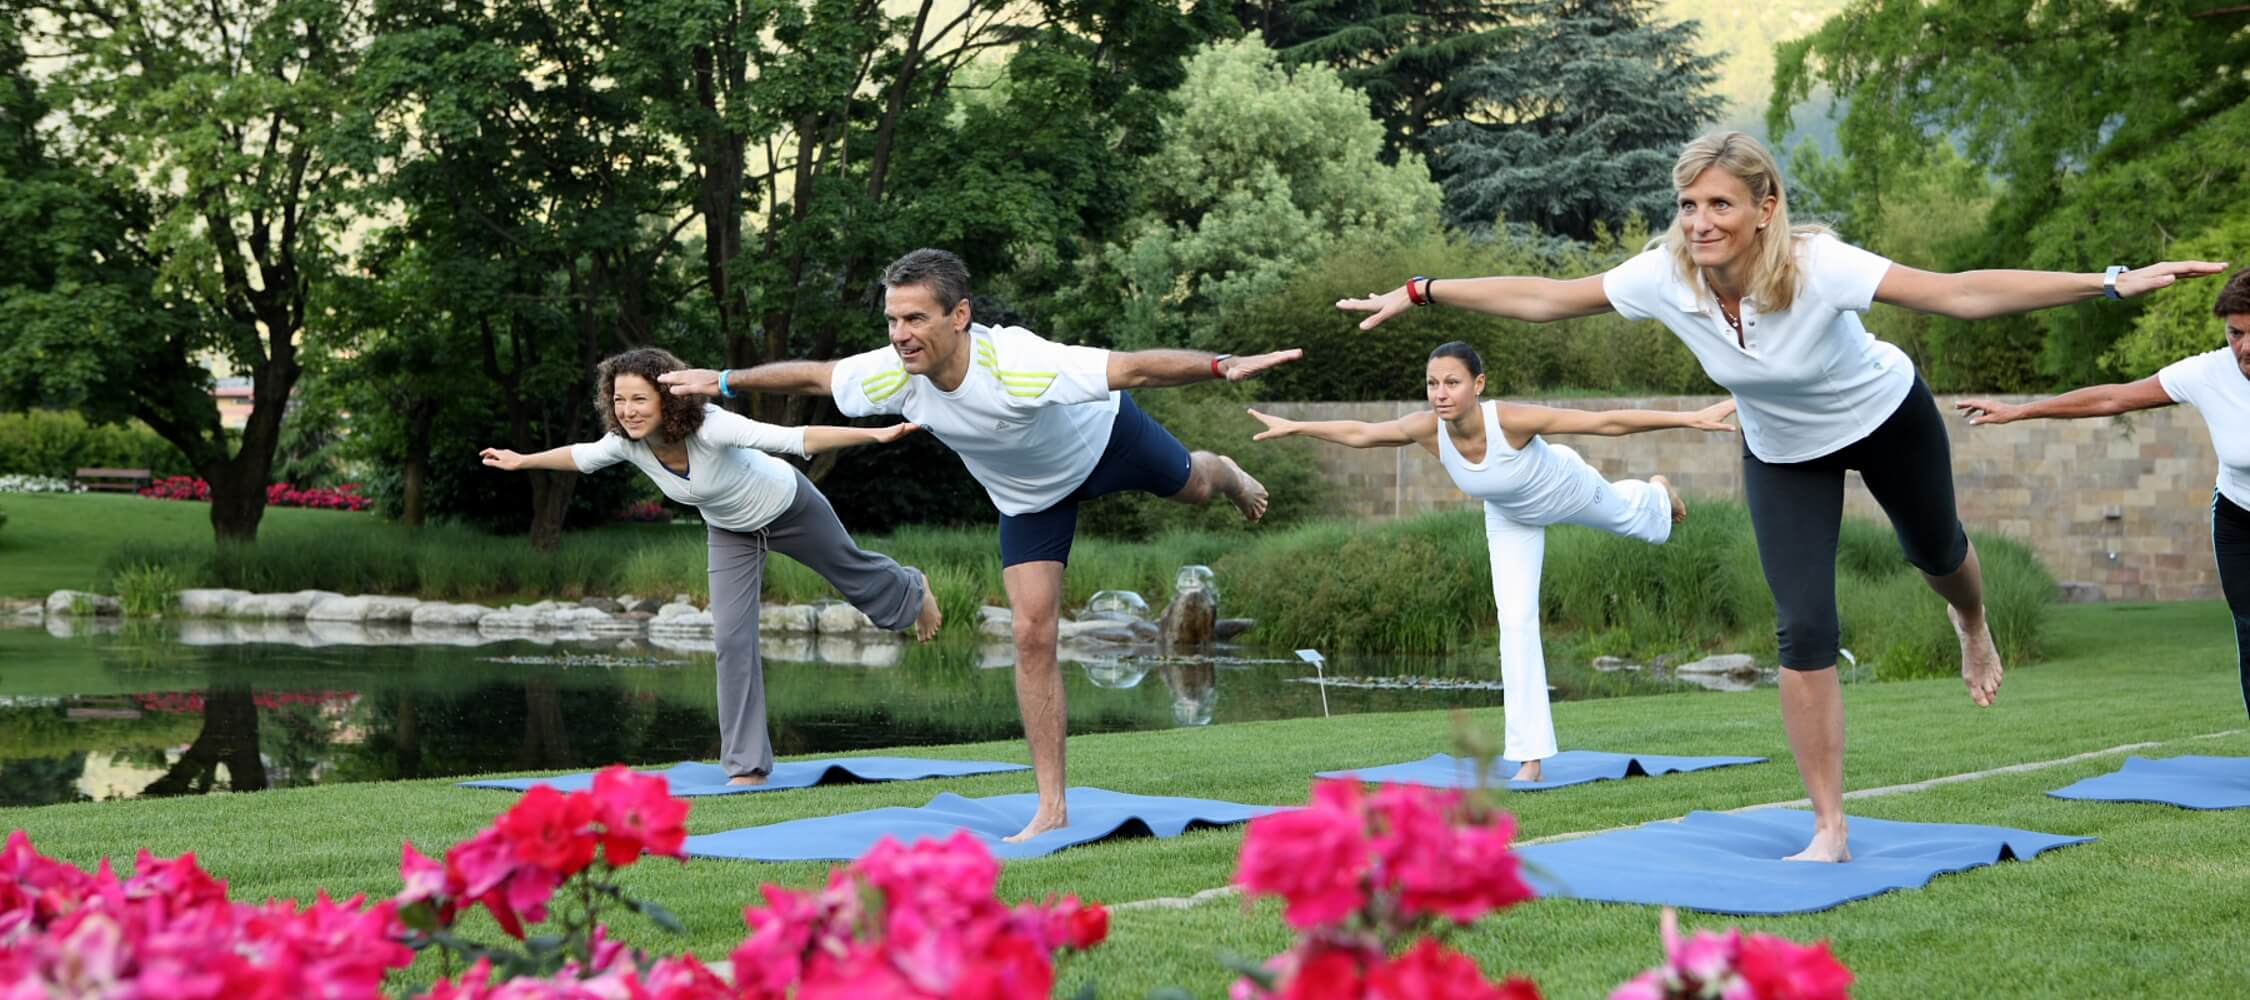 Italien-Trentino_Suedtirol_Alto_Adige_Merano_Meran_Sport_Fitness_Yoga_Therme_Park_Wellness_Balance_MGM-Mario-Entero_5_2250x1000